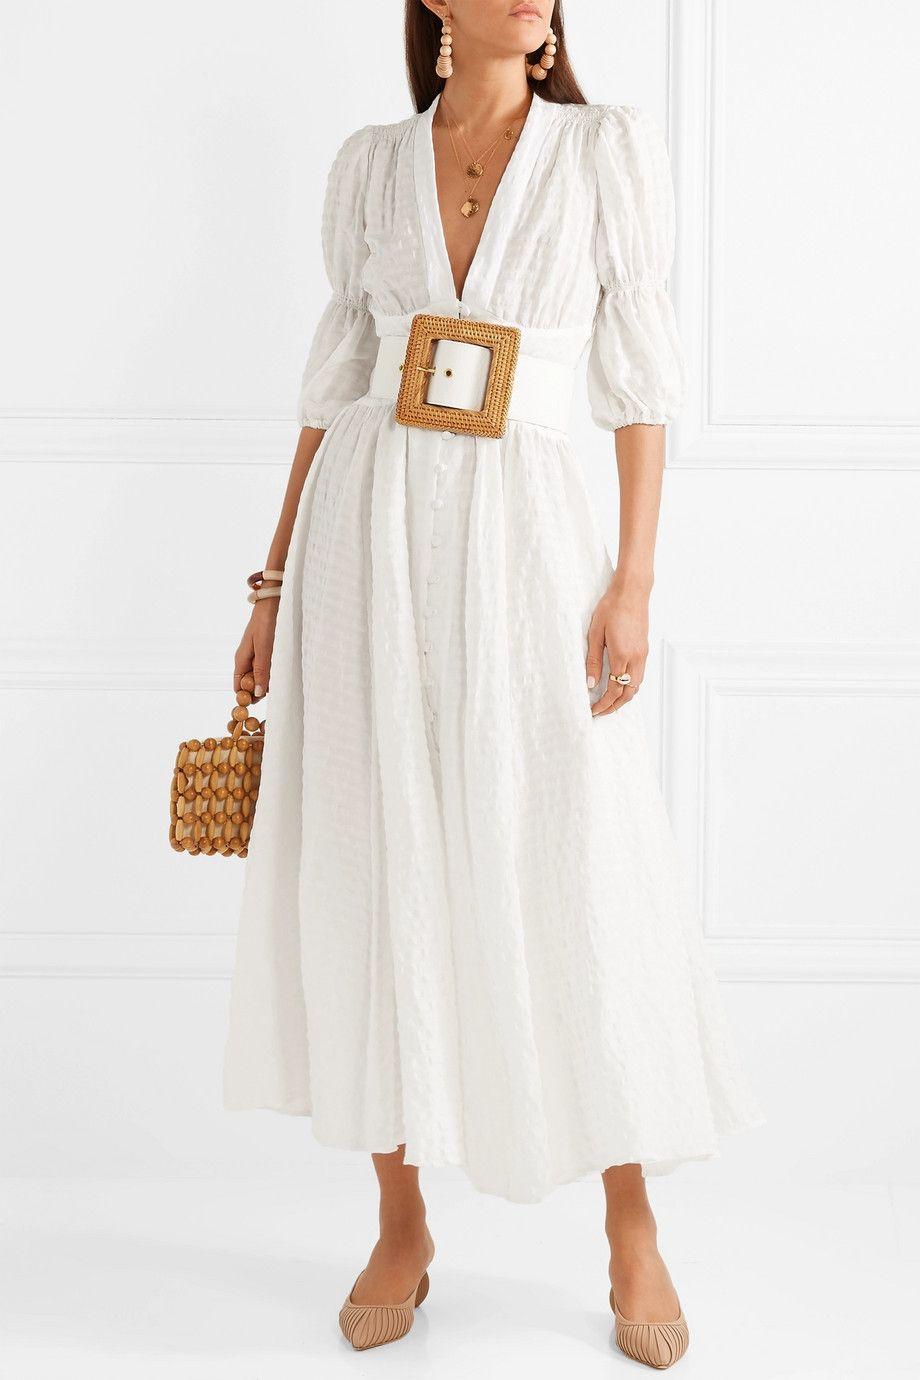 15 Seriously Luxurious Sustainable Fashion Brands Eluxe Magazine Maxi Dress Dresses White Maxi Dresses